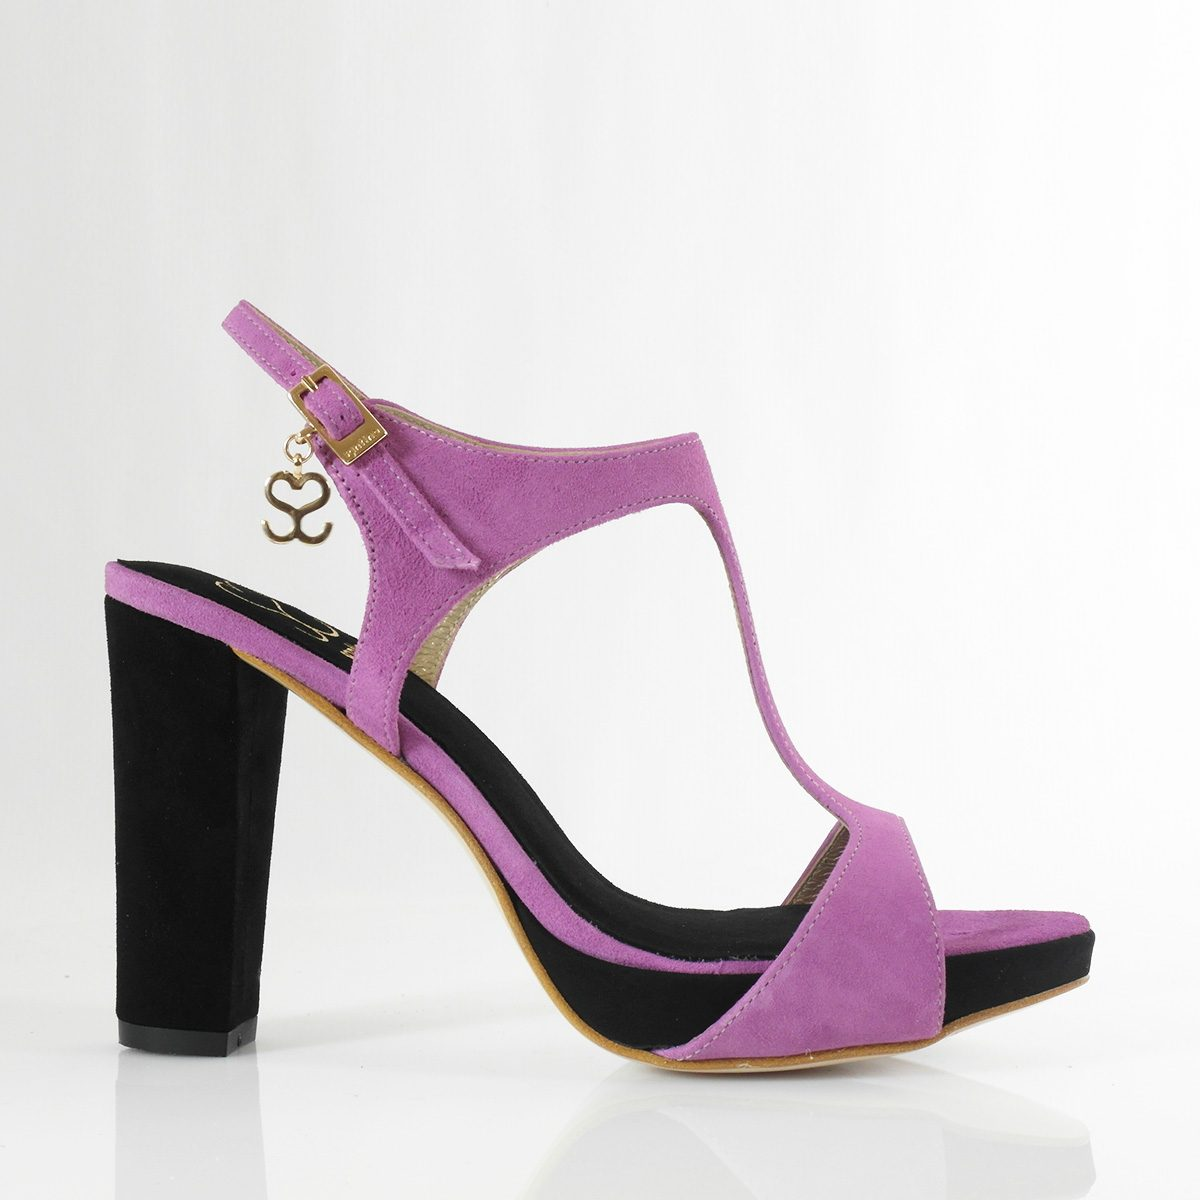 SANDALIA MOD.1181 (10cm) - zapatos personalizados fiesta